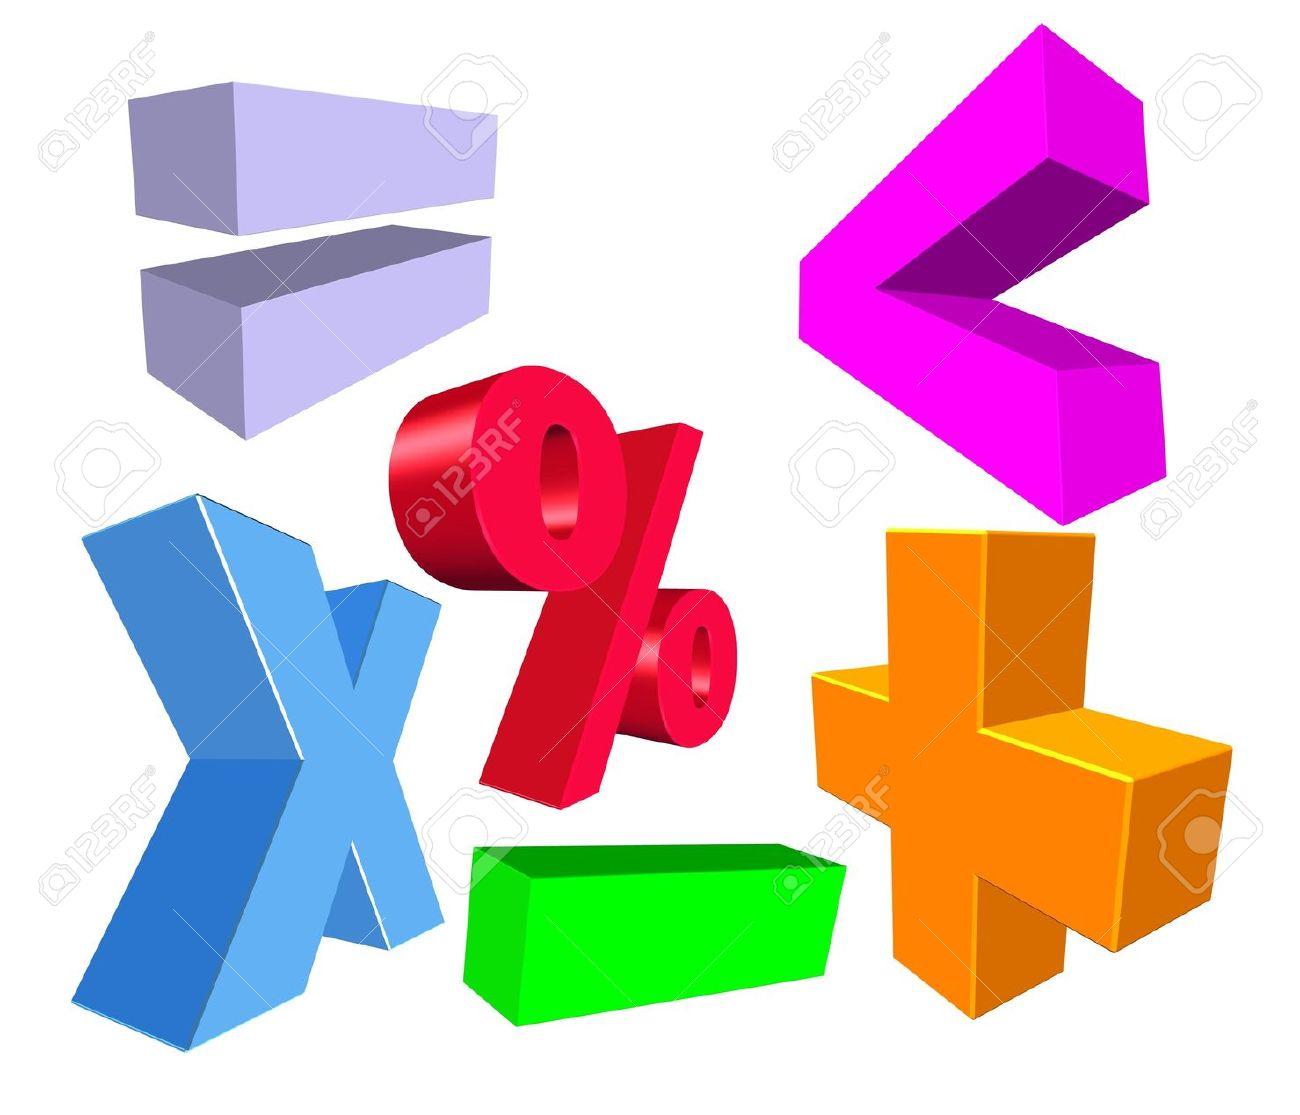 Illustration of 3d colorful math symbols stock photo picture and illustration of 3d colorful math symbols stock illustration 9008727 biocorpaavc Gallery